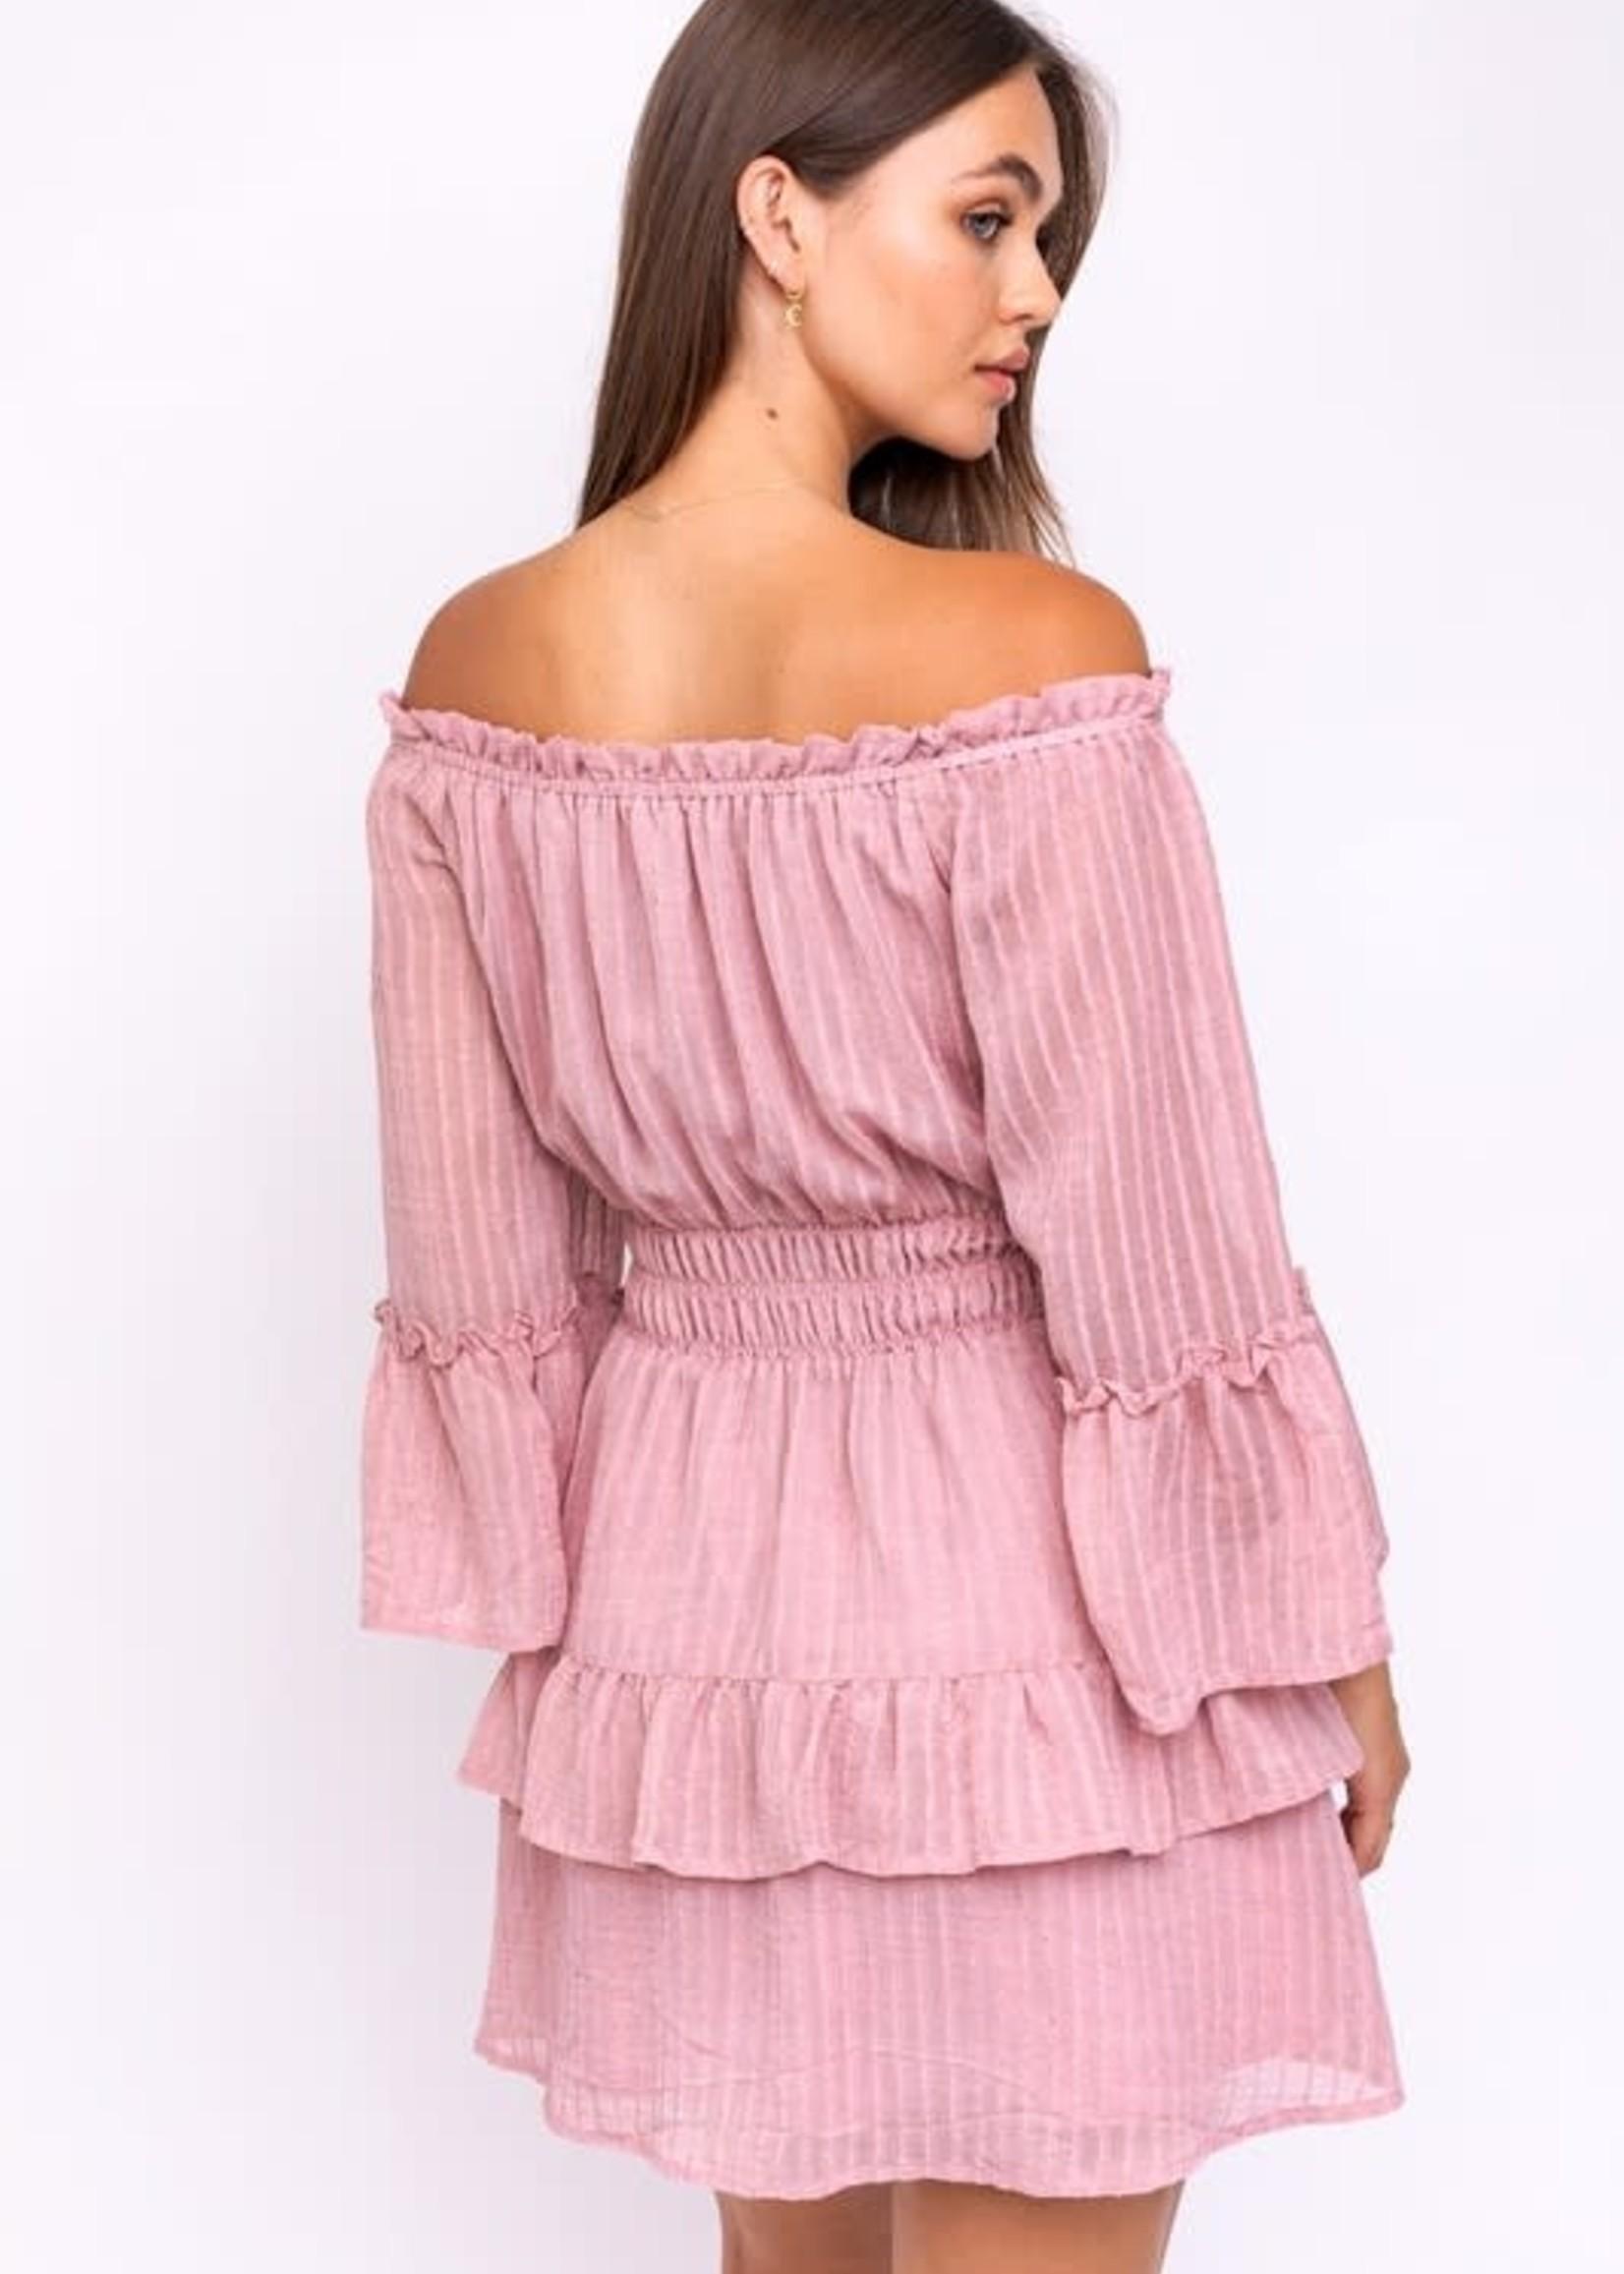 Best Of All Fall Blush Dress